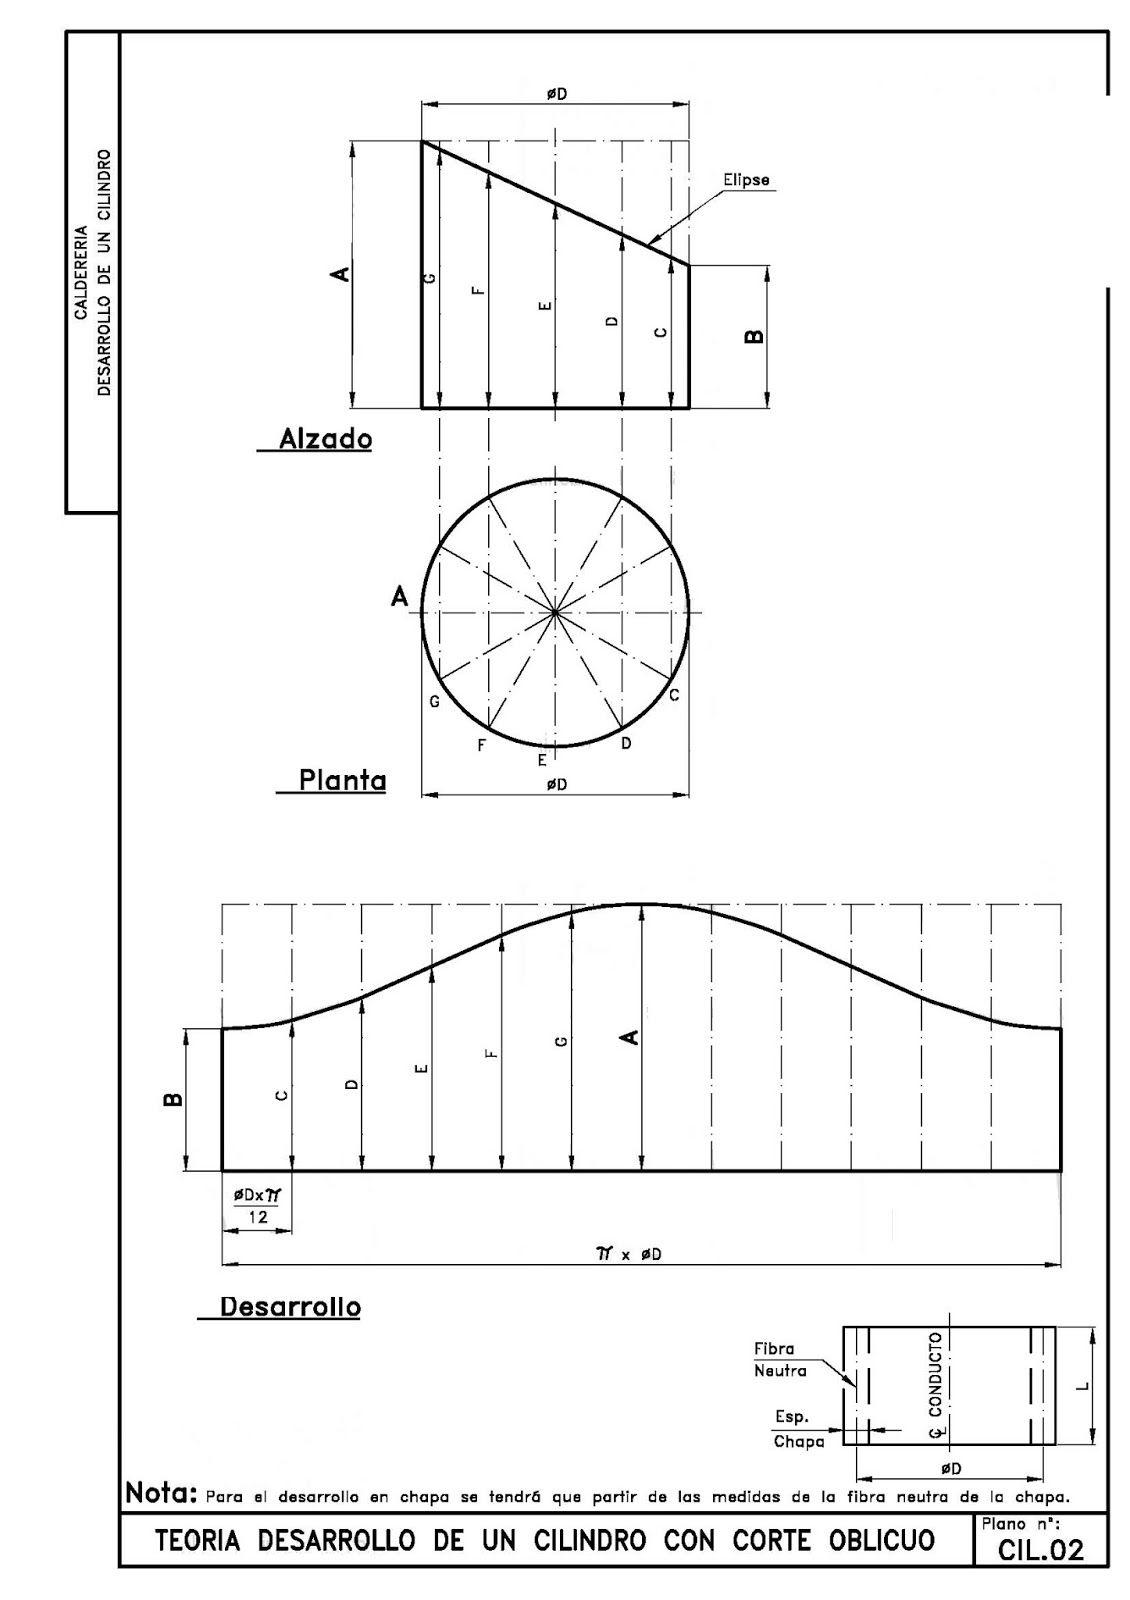 Caldereria Desarrollo De Cilindros Caldereria Geometria Descriptiva Tecnicas De Dibujo